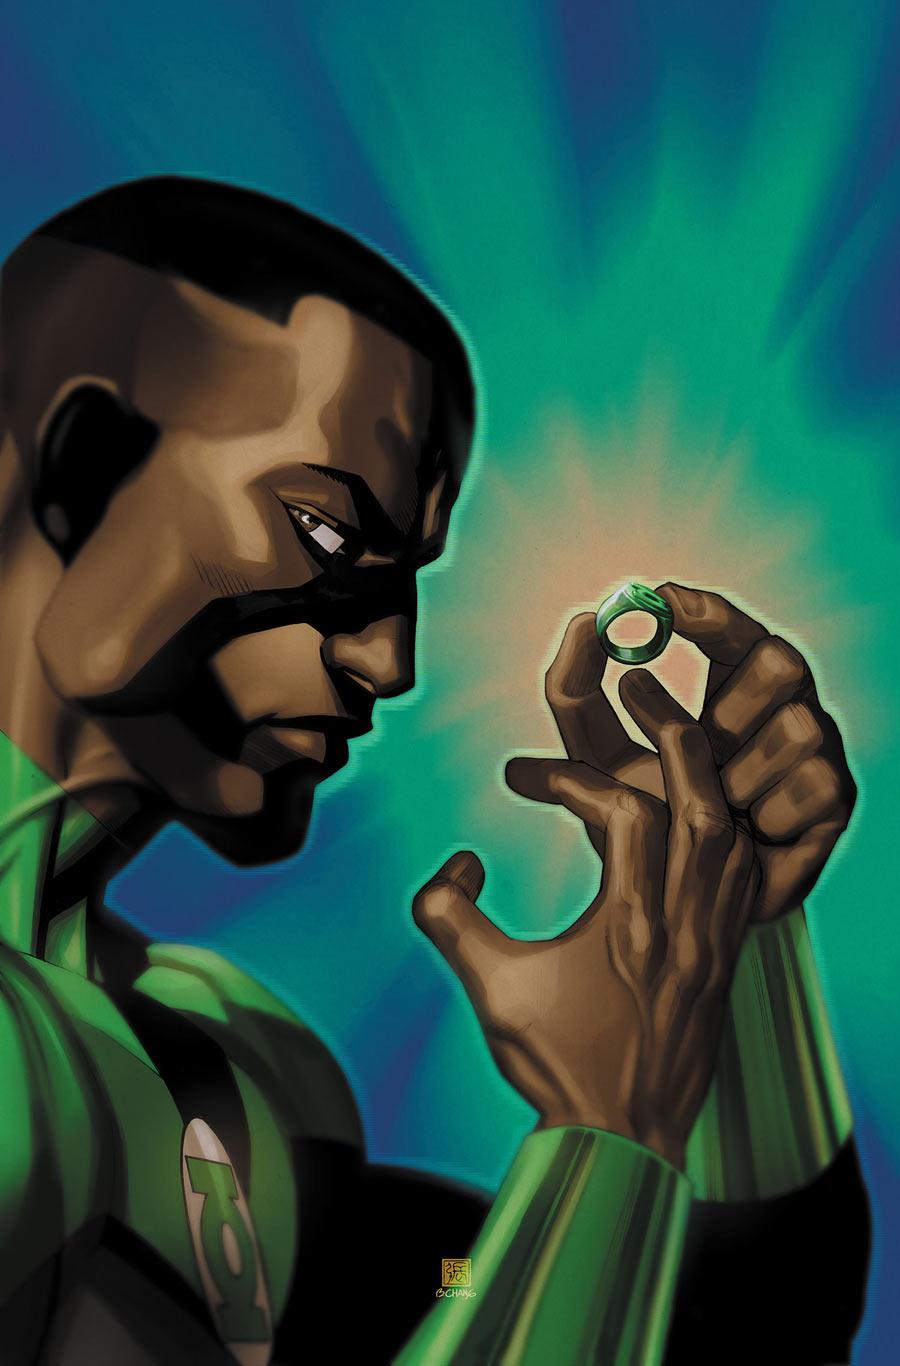 ghettomanga green lantern stewart bernard chang on hell yes